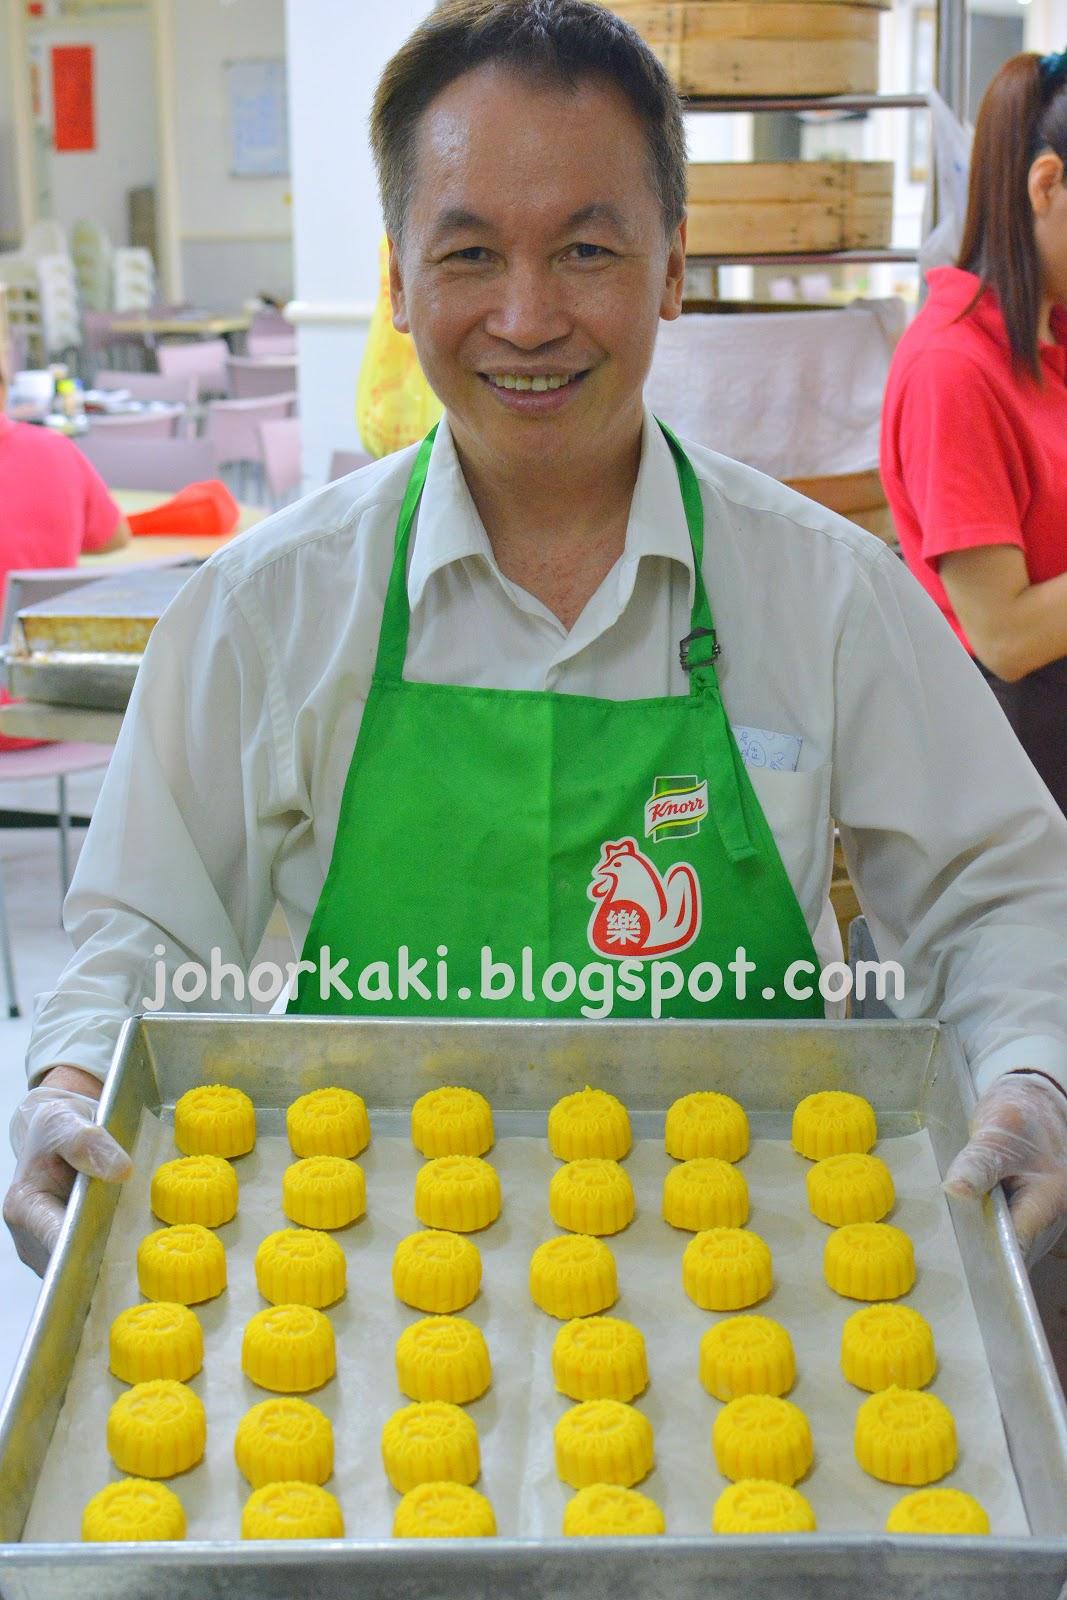 Peninsula Hong Kong Style Egg Custard Mooncakes by East Bistro Singapore JK1226 香港半島酒店奶黃月餅 |Johor Kaki Travels for Food